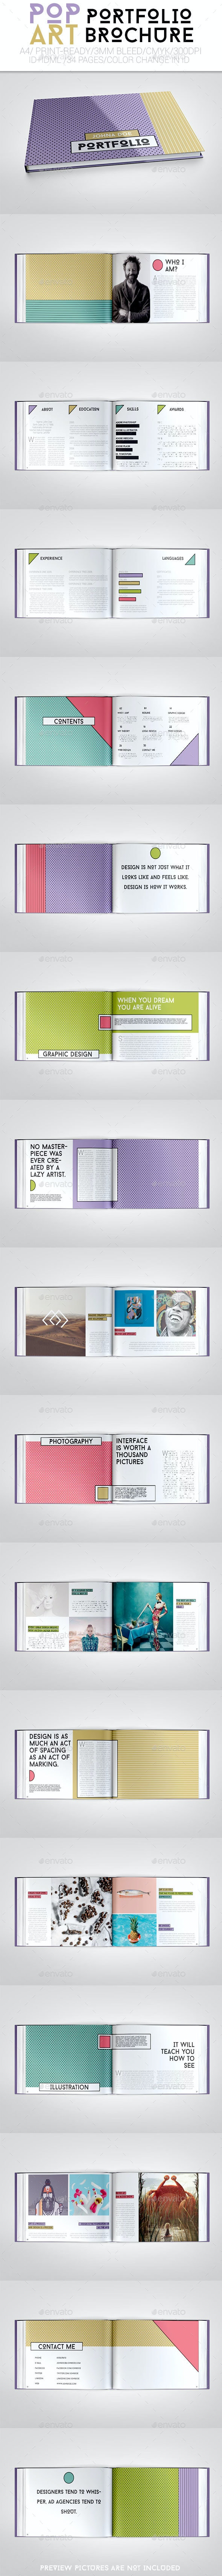 Pop Art Portfolio Brochure - Brochures Print Templates